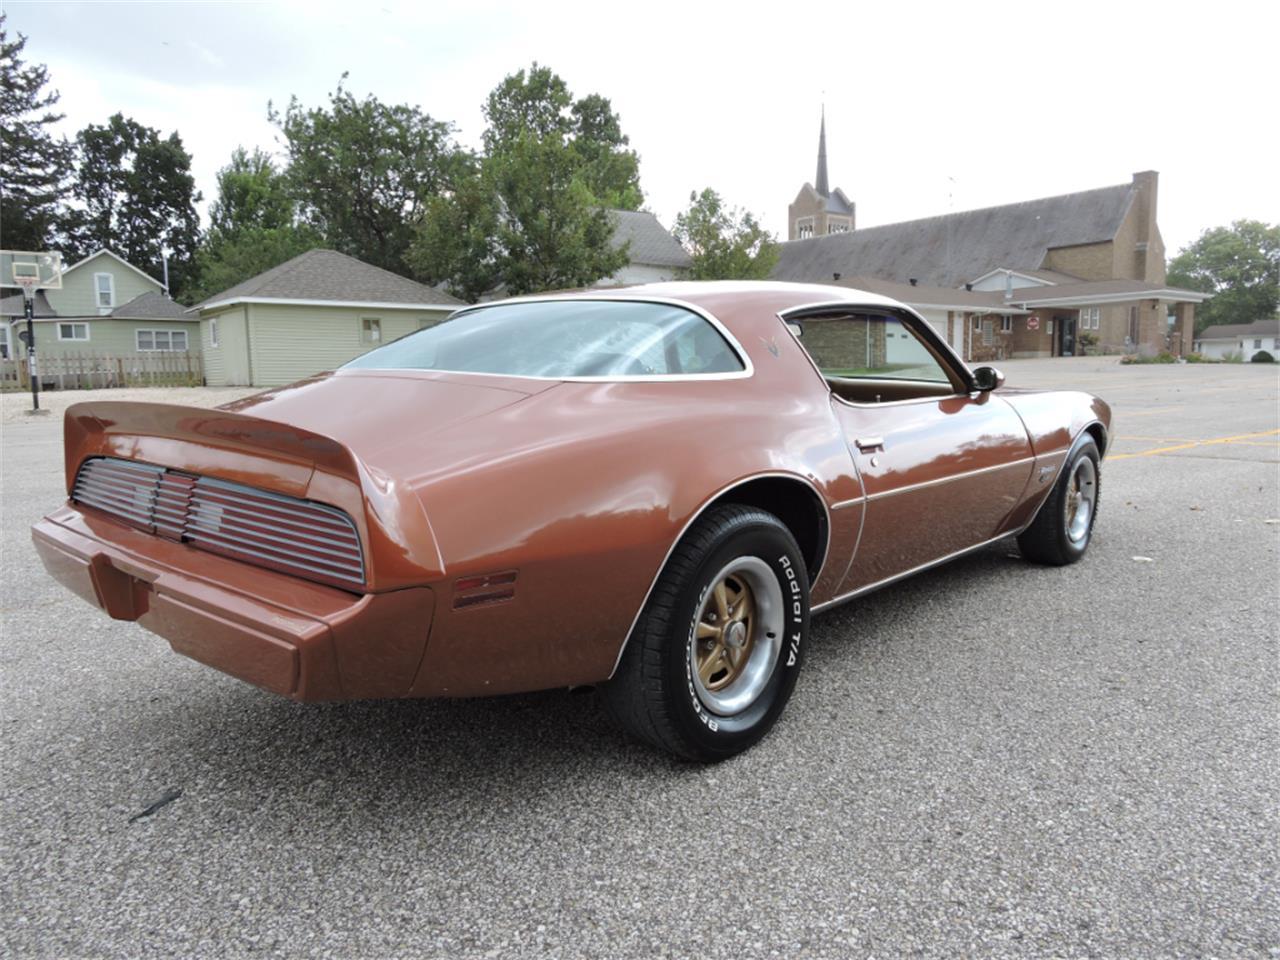 Large Picture of 1980 Pontiac Firebird located in Greene Iowa - $10,995.00 - M8EV